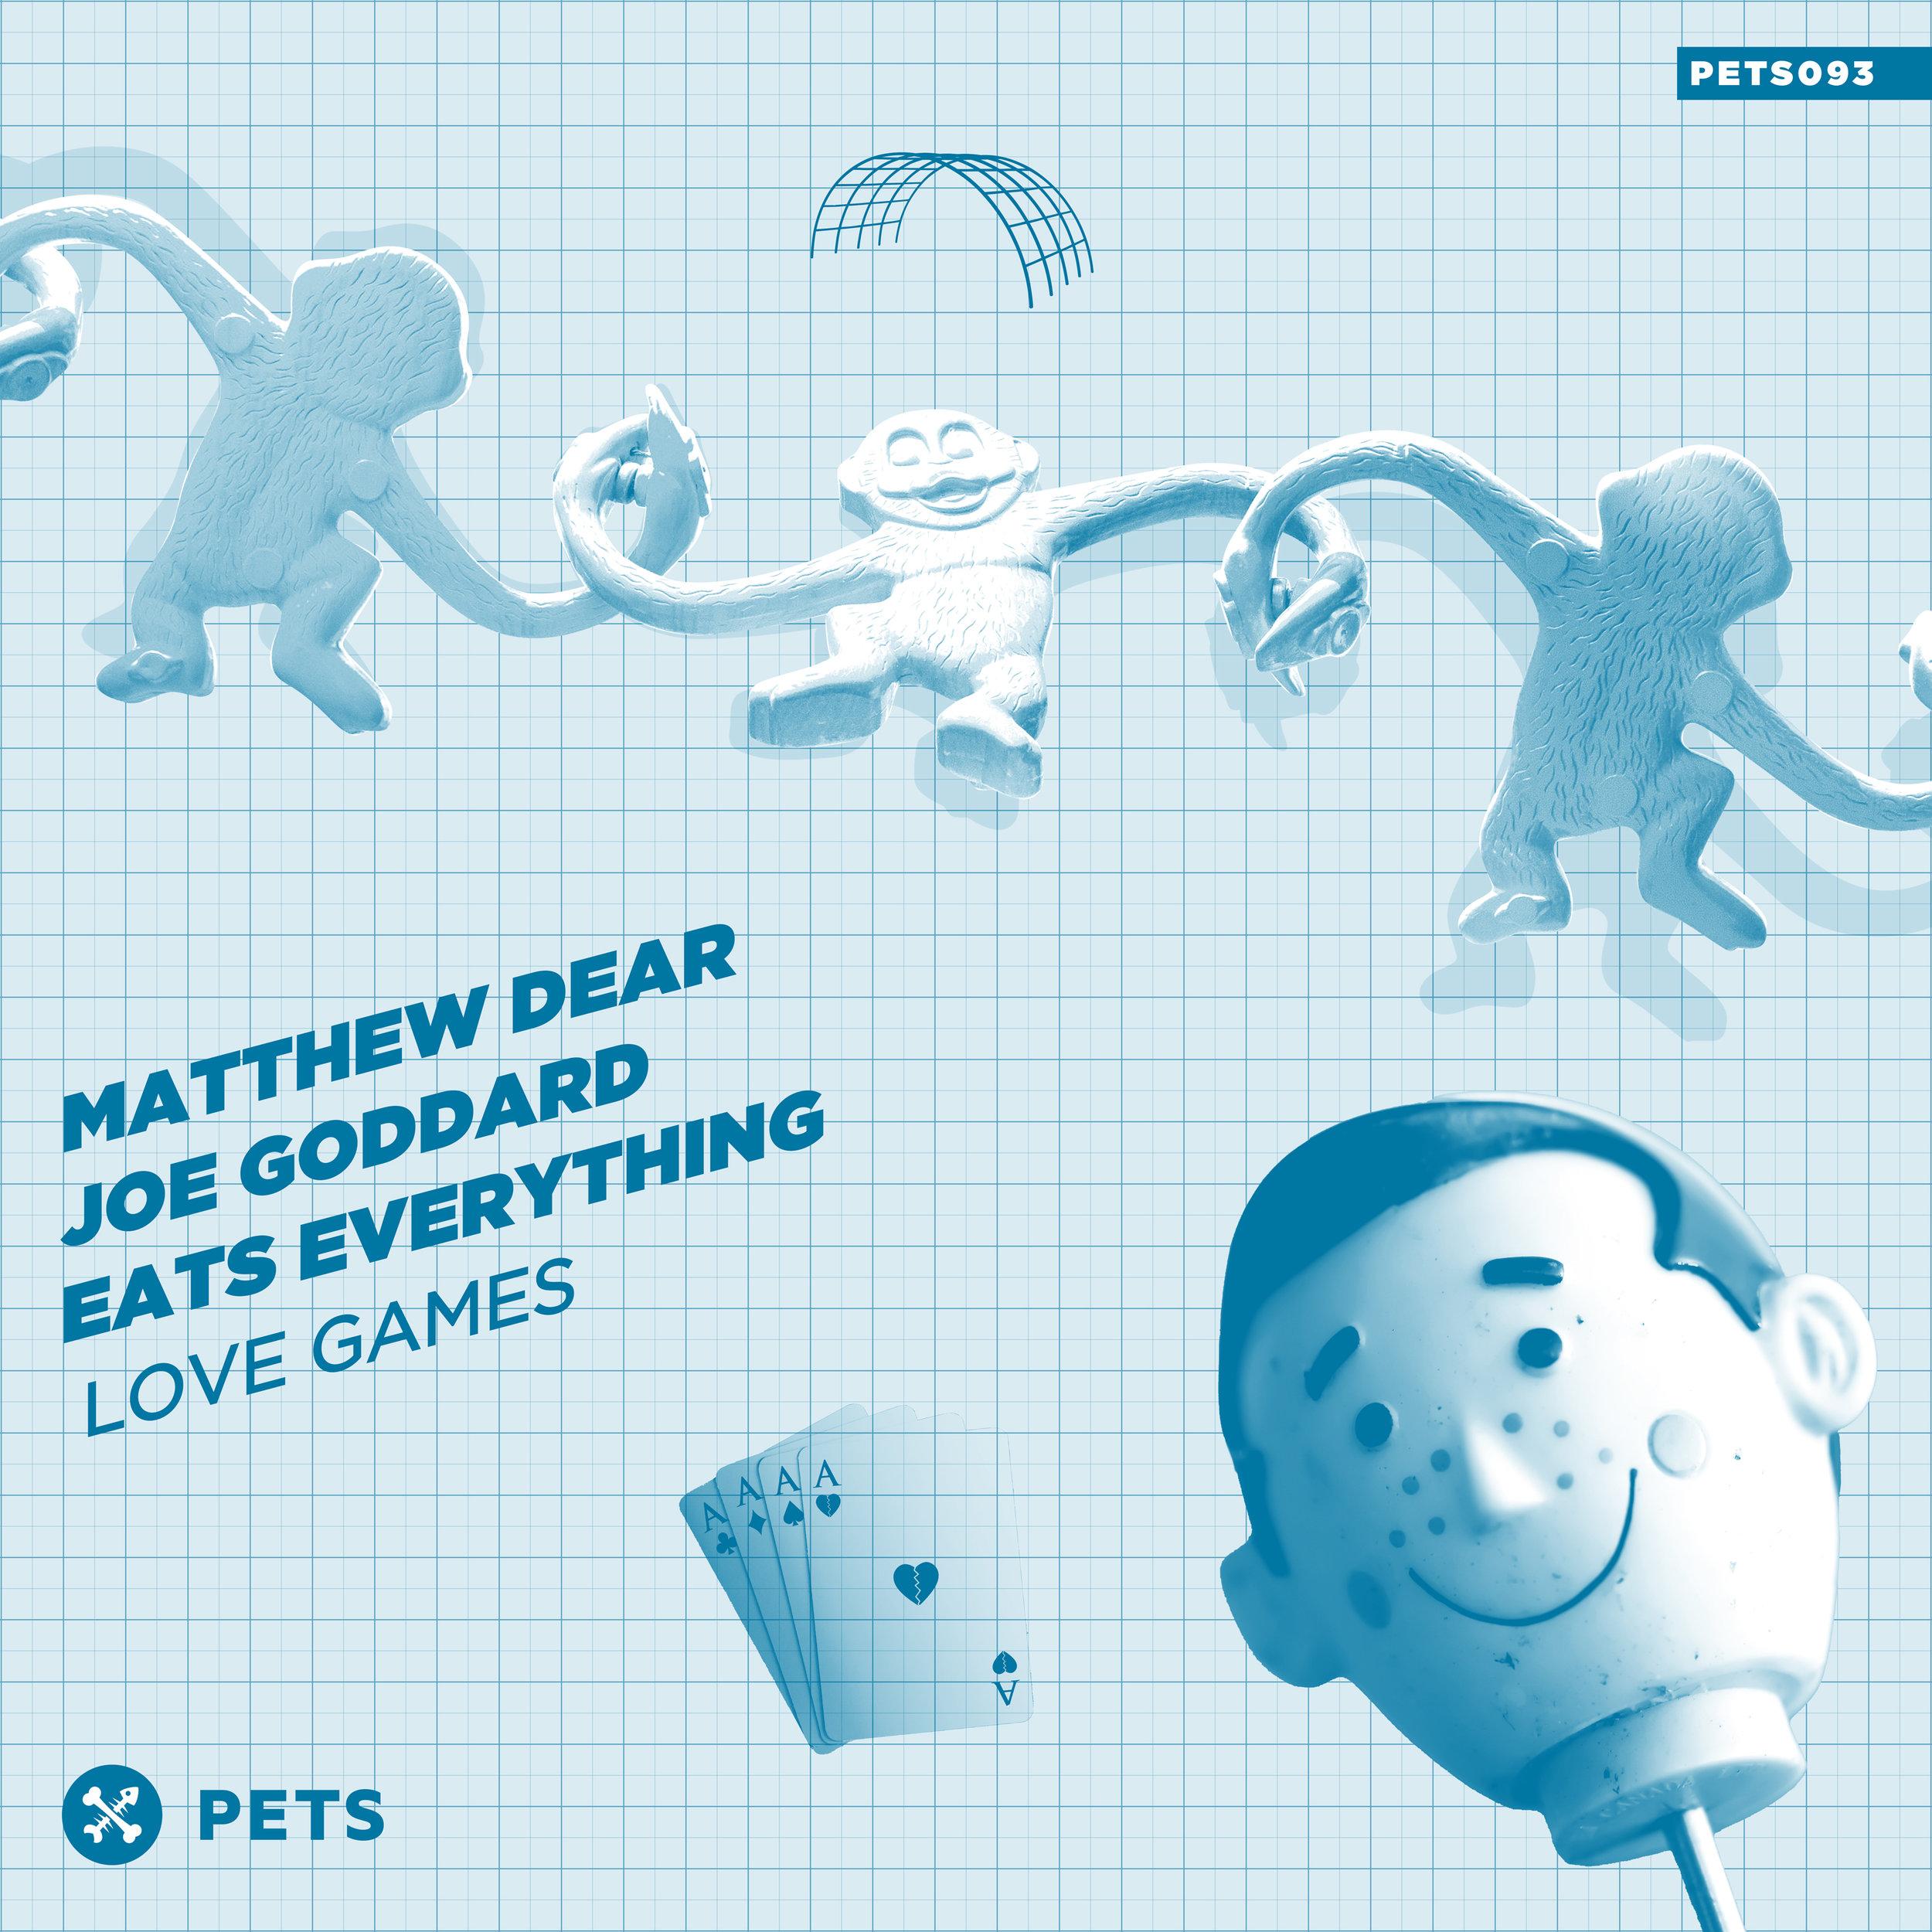 Matthew Dear, Joe Goddard & Eats Everything - Love Games